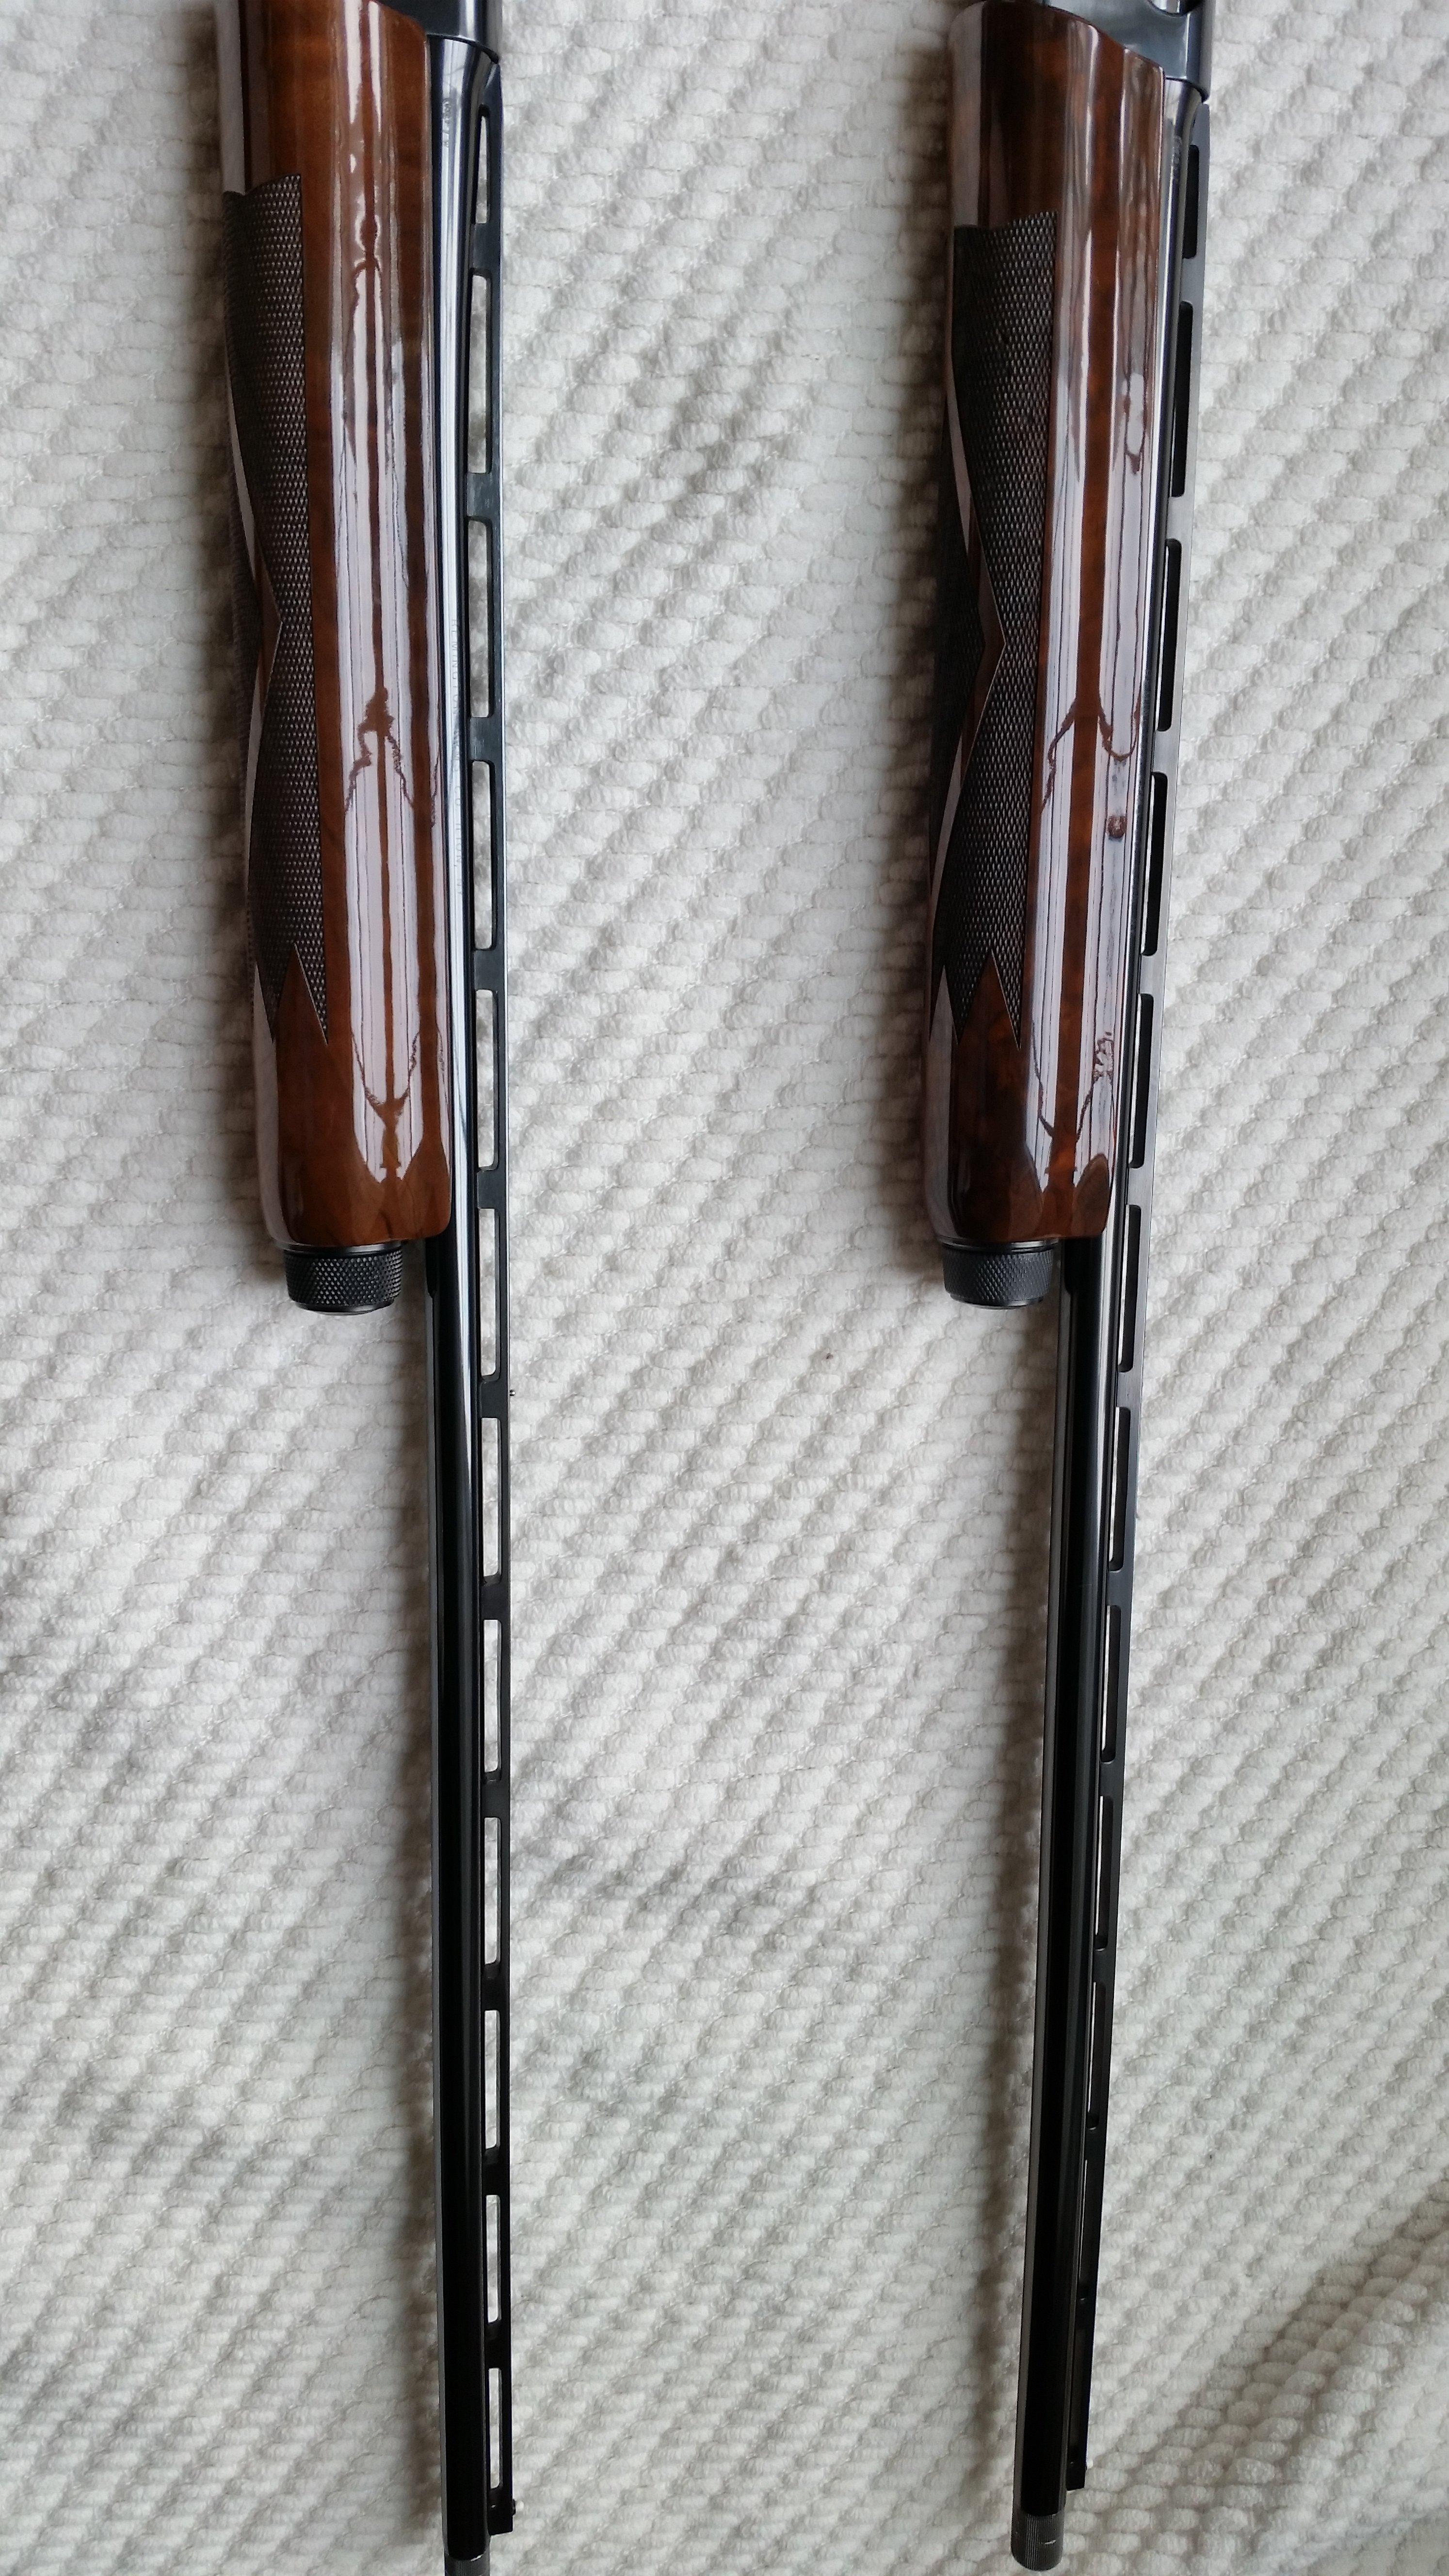 Sold - Remington 1100 sporting  410 and 28ga   Trap Shooters